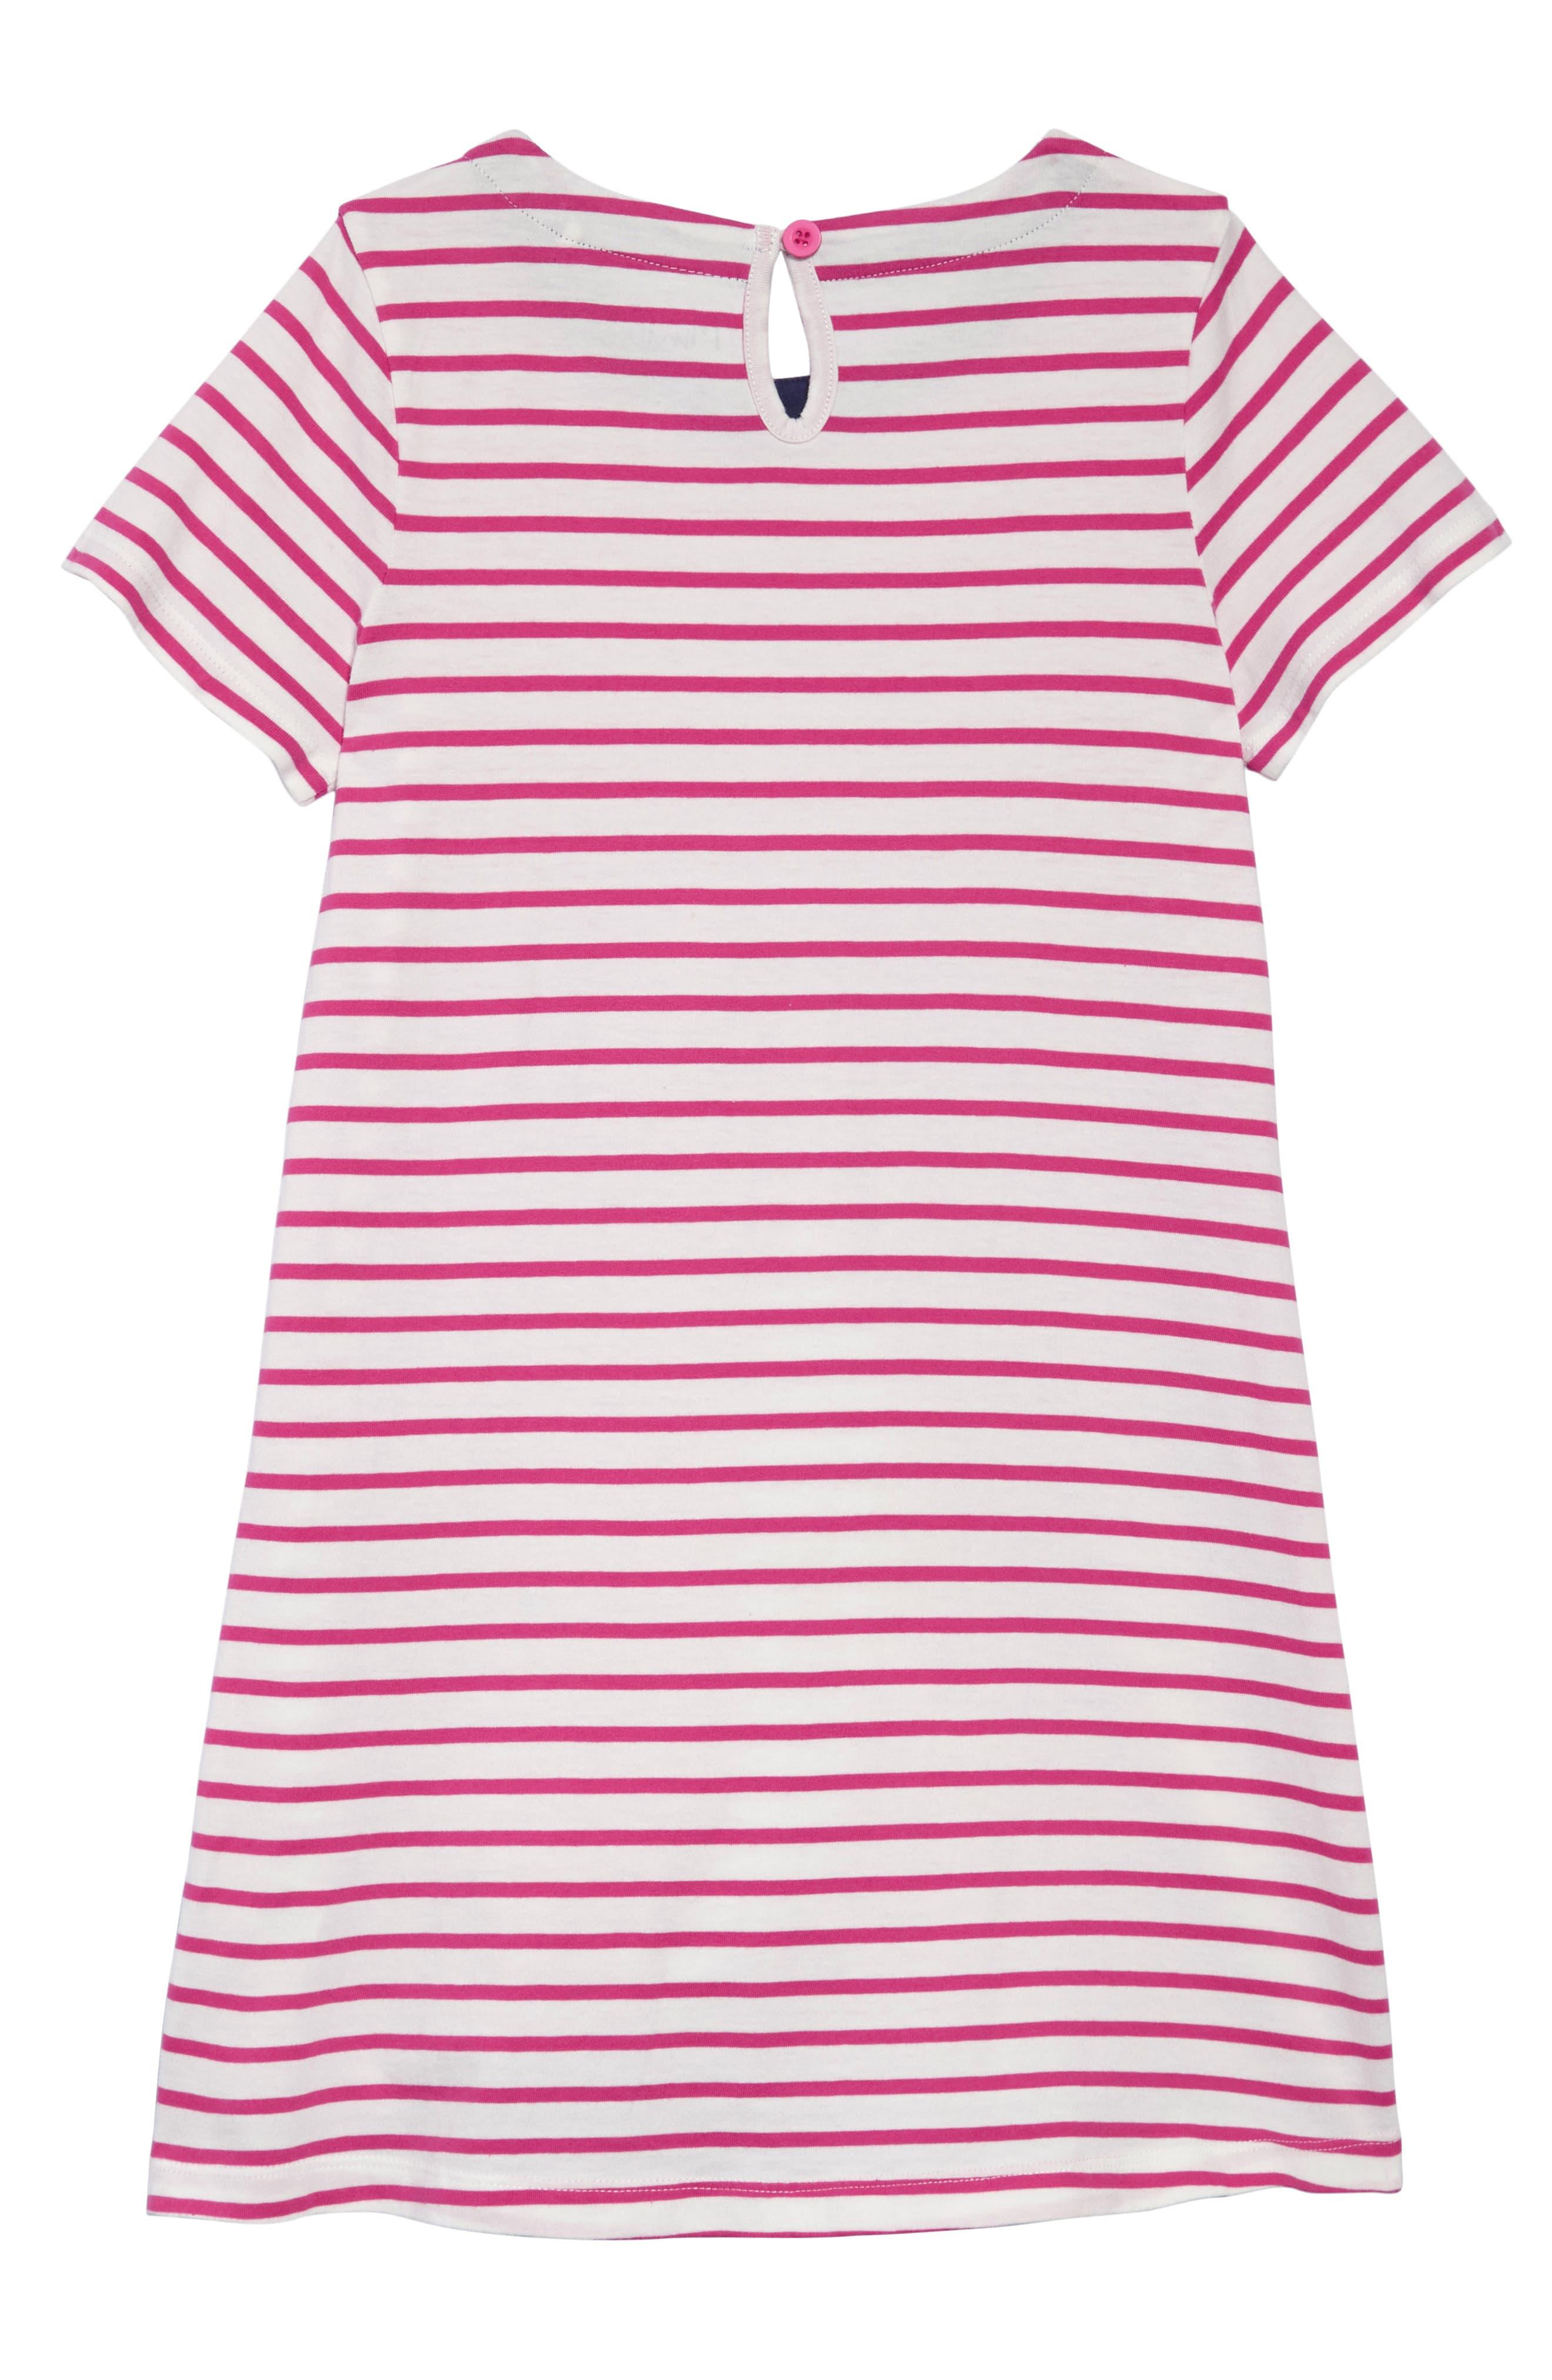 Summer Appliqué T-Shirt Dress,                             Alternate thumbnail 2, color,                             Mid Pink Stripe Shark Pnk